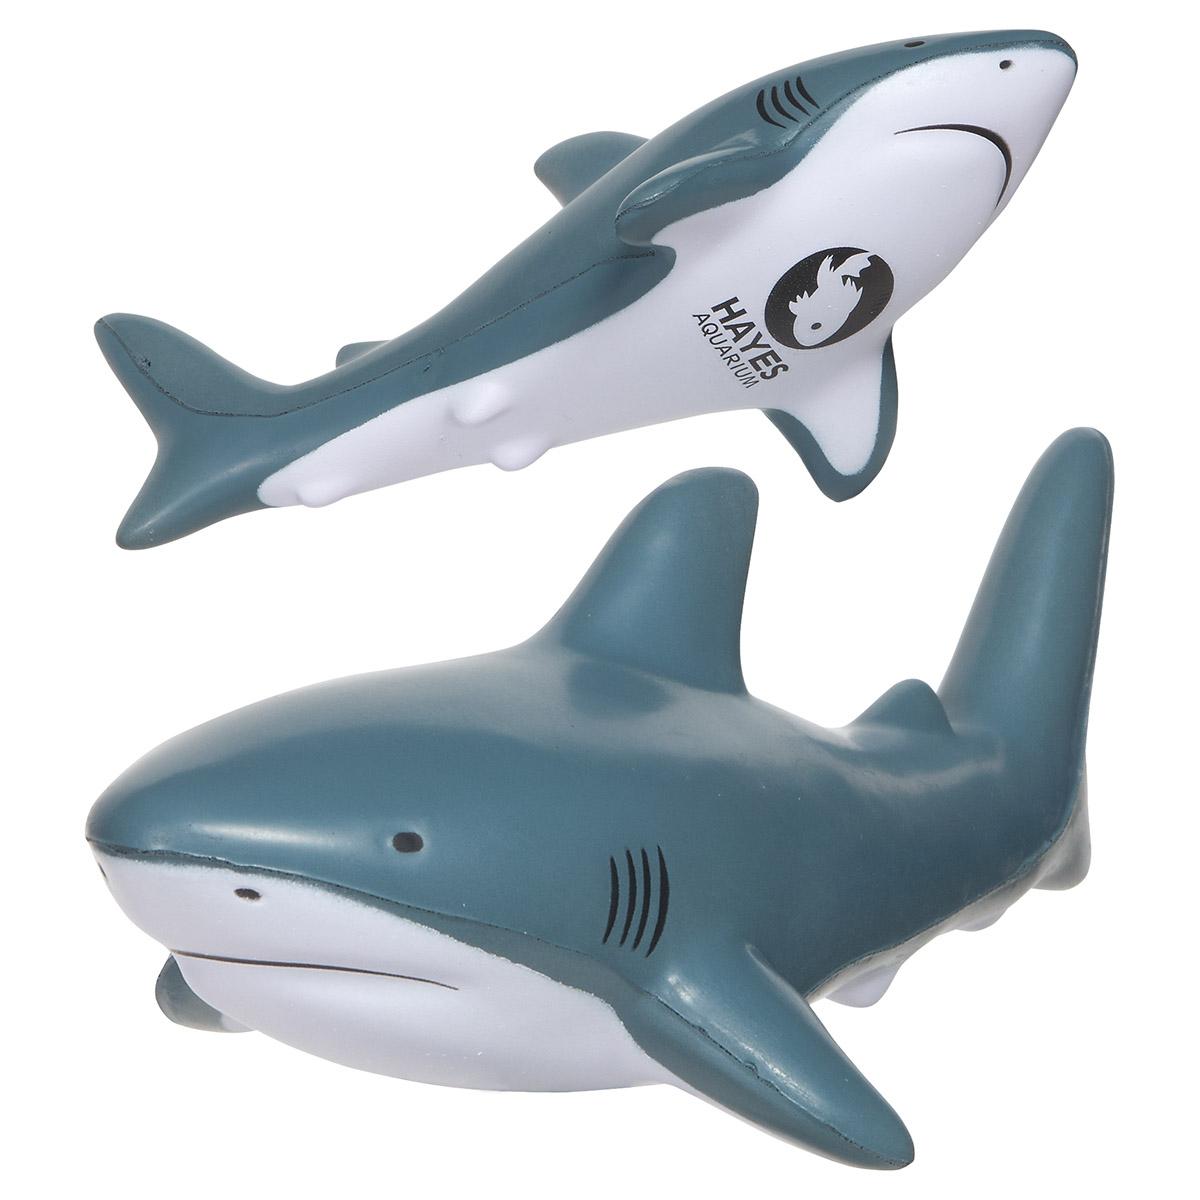 Shark Stress Reliever, LAA-SK15, 1 Colour Imprint